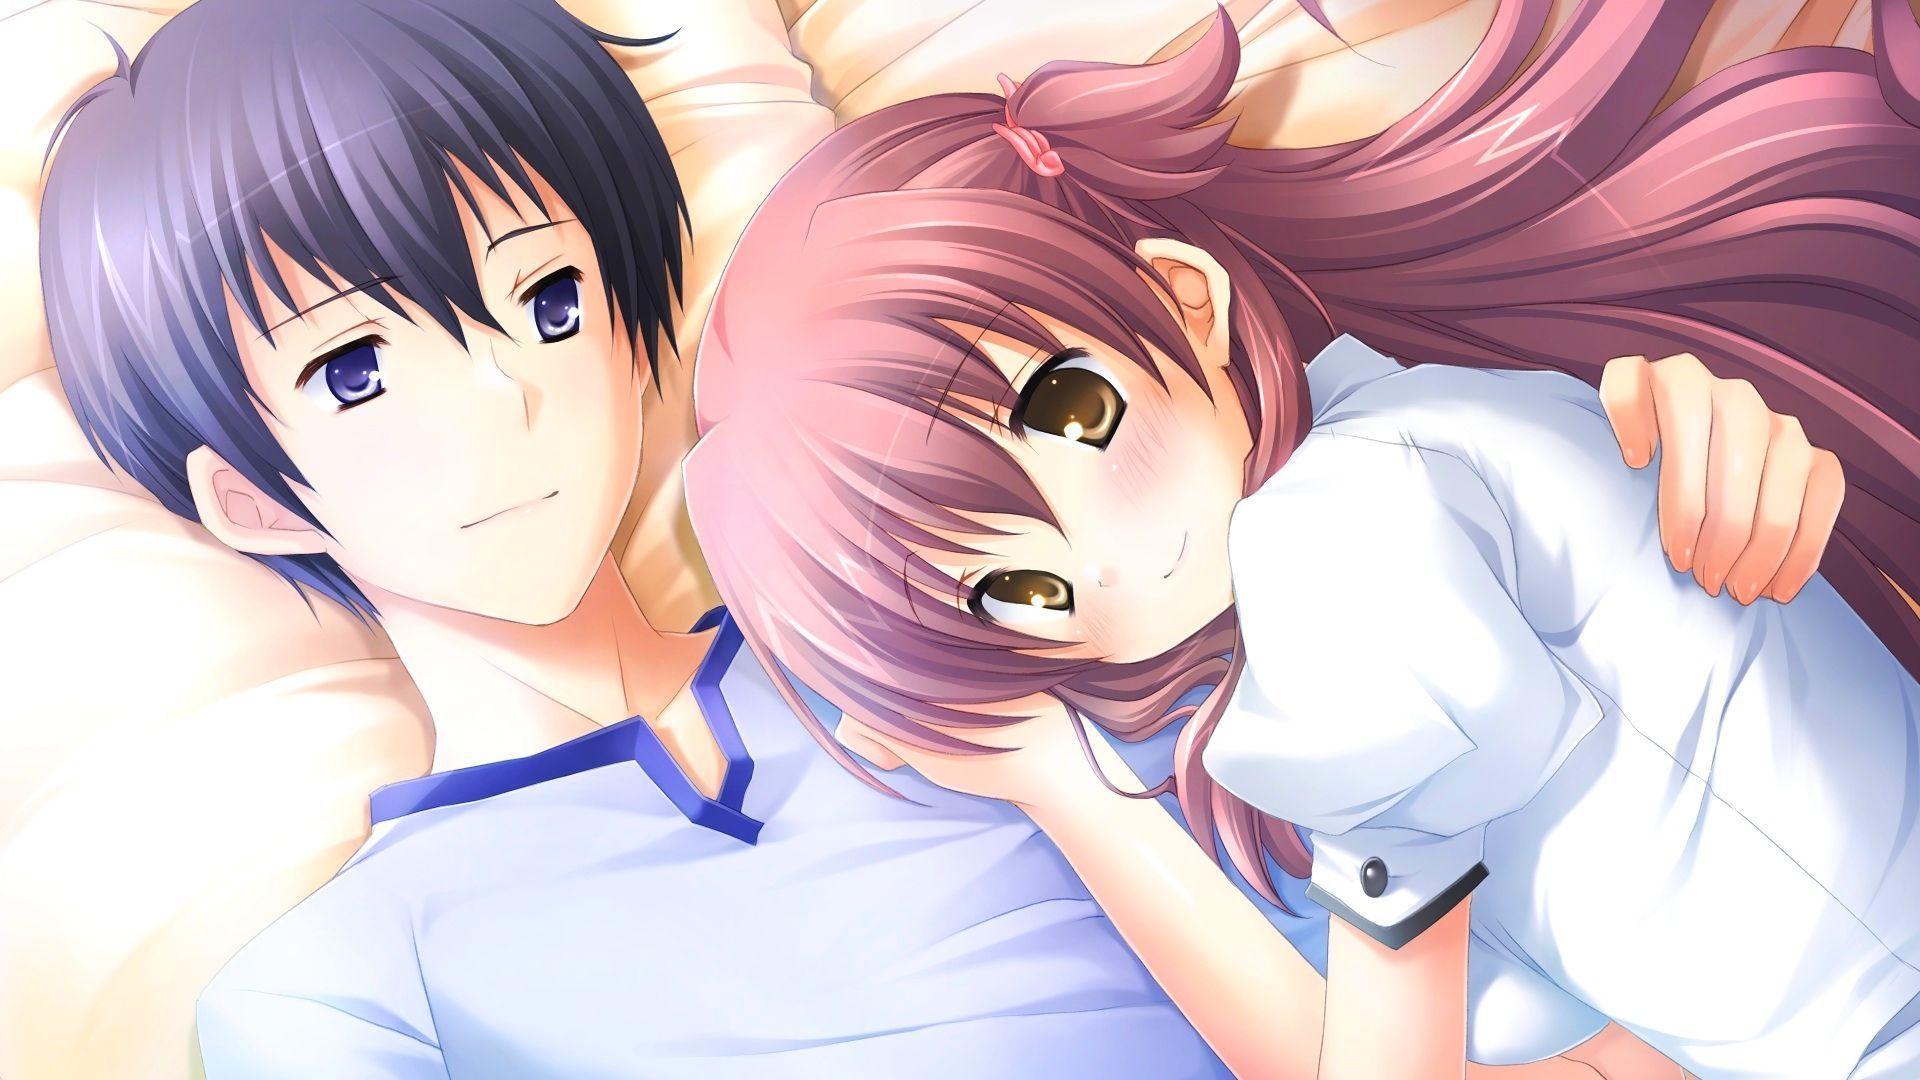 anime couple hugging wallpapers - photo #48